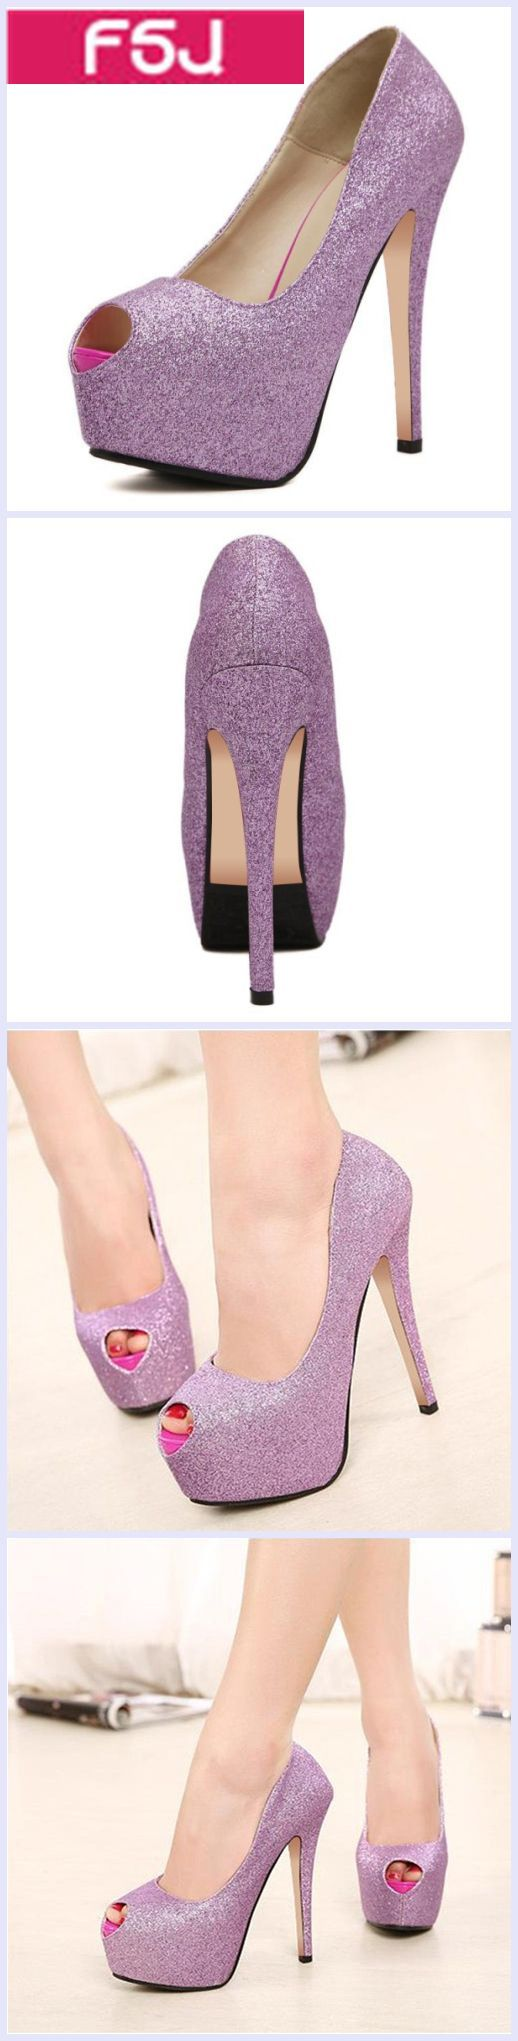 Women's Style Pumps Fall Outfits 2017 Women's Fall Fashion Wedding Dresses Shoes Women's Purple Peep Toe Platform Stiletto Heels Glitter Pumps Wedding Dresses Shoes Prom Dresses Heels| FSJ